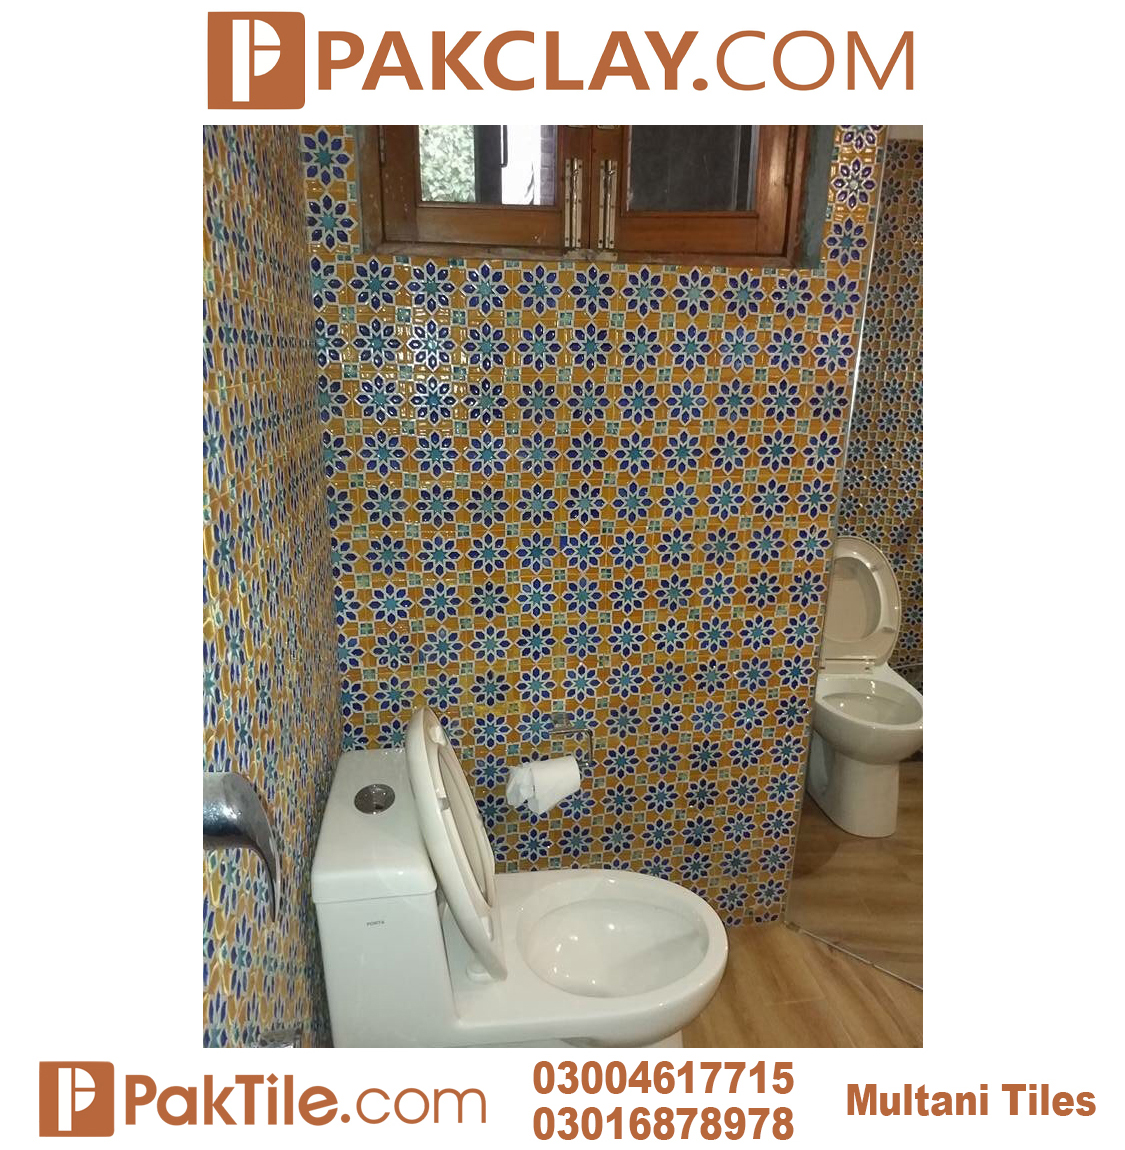 Pak Clay Cheap Rates Toilet Blue Multani Tiles For Washroom